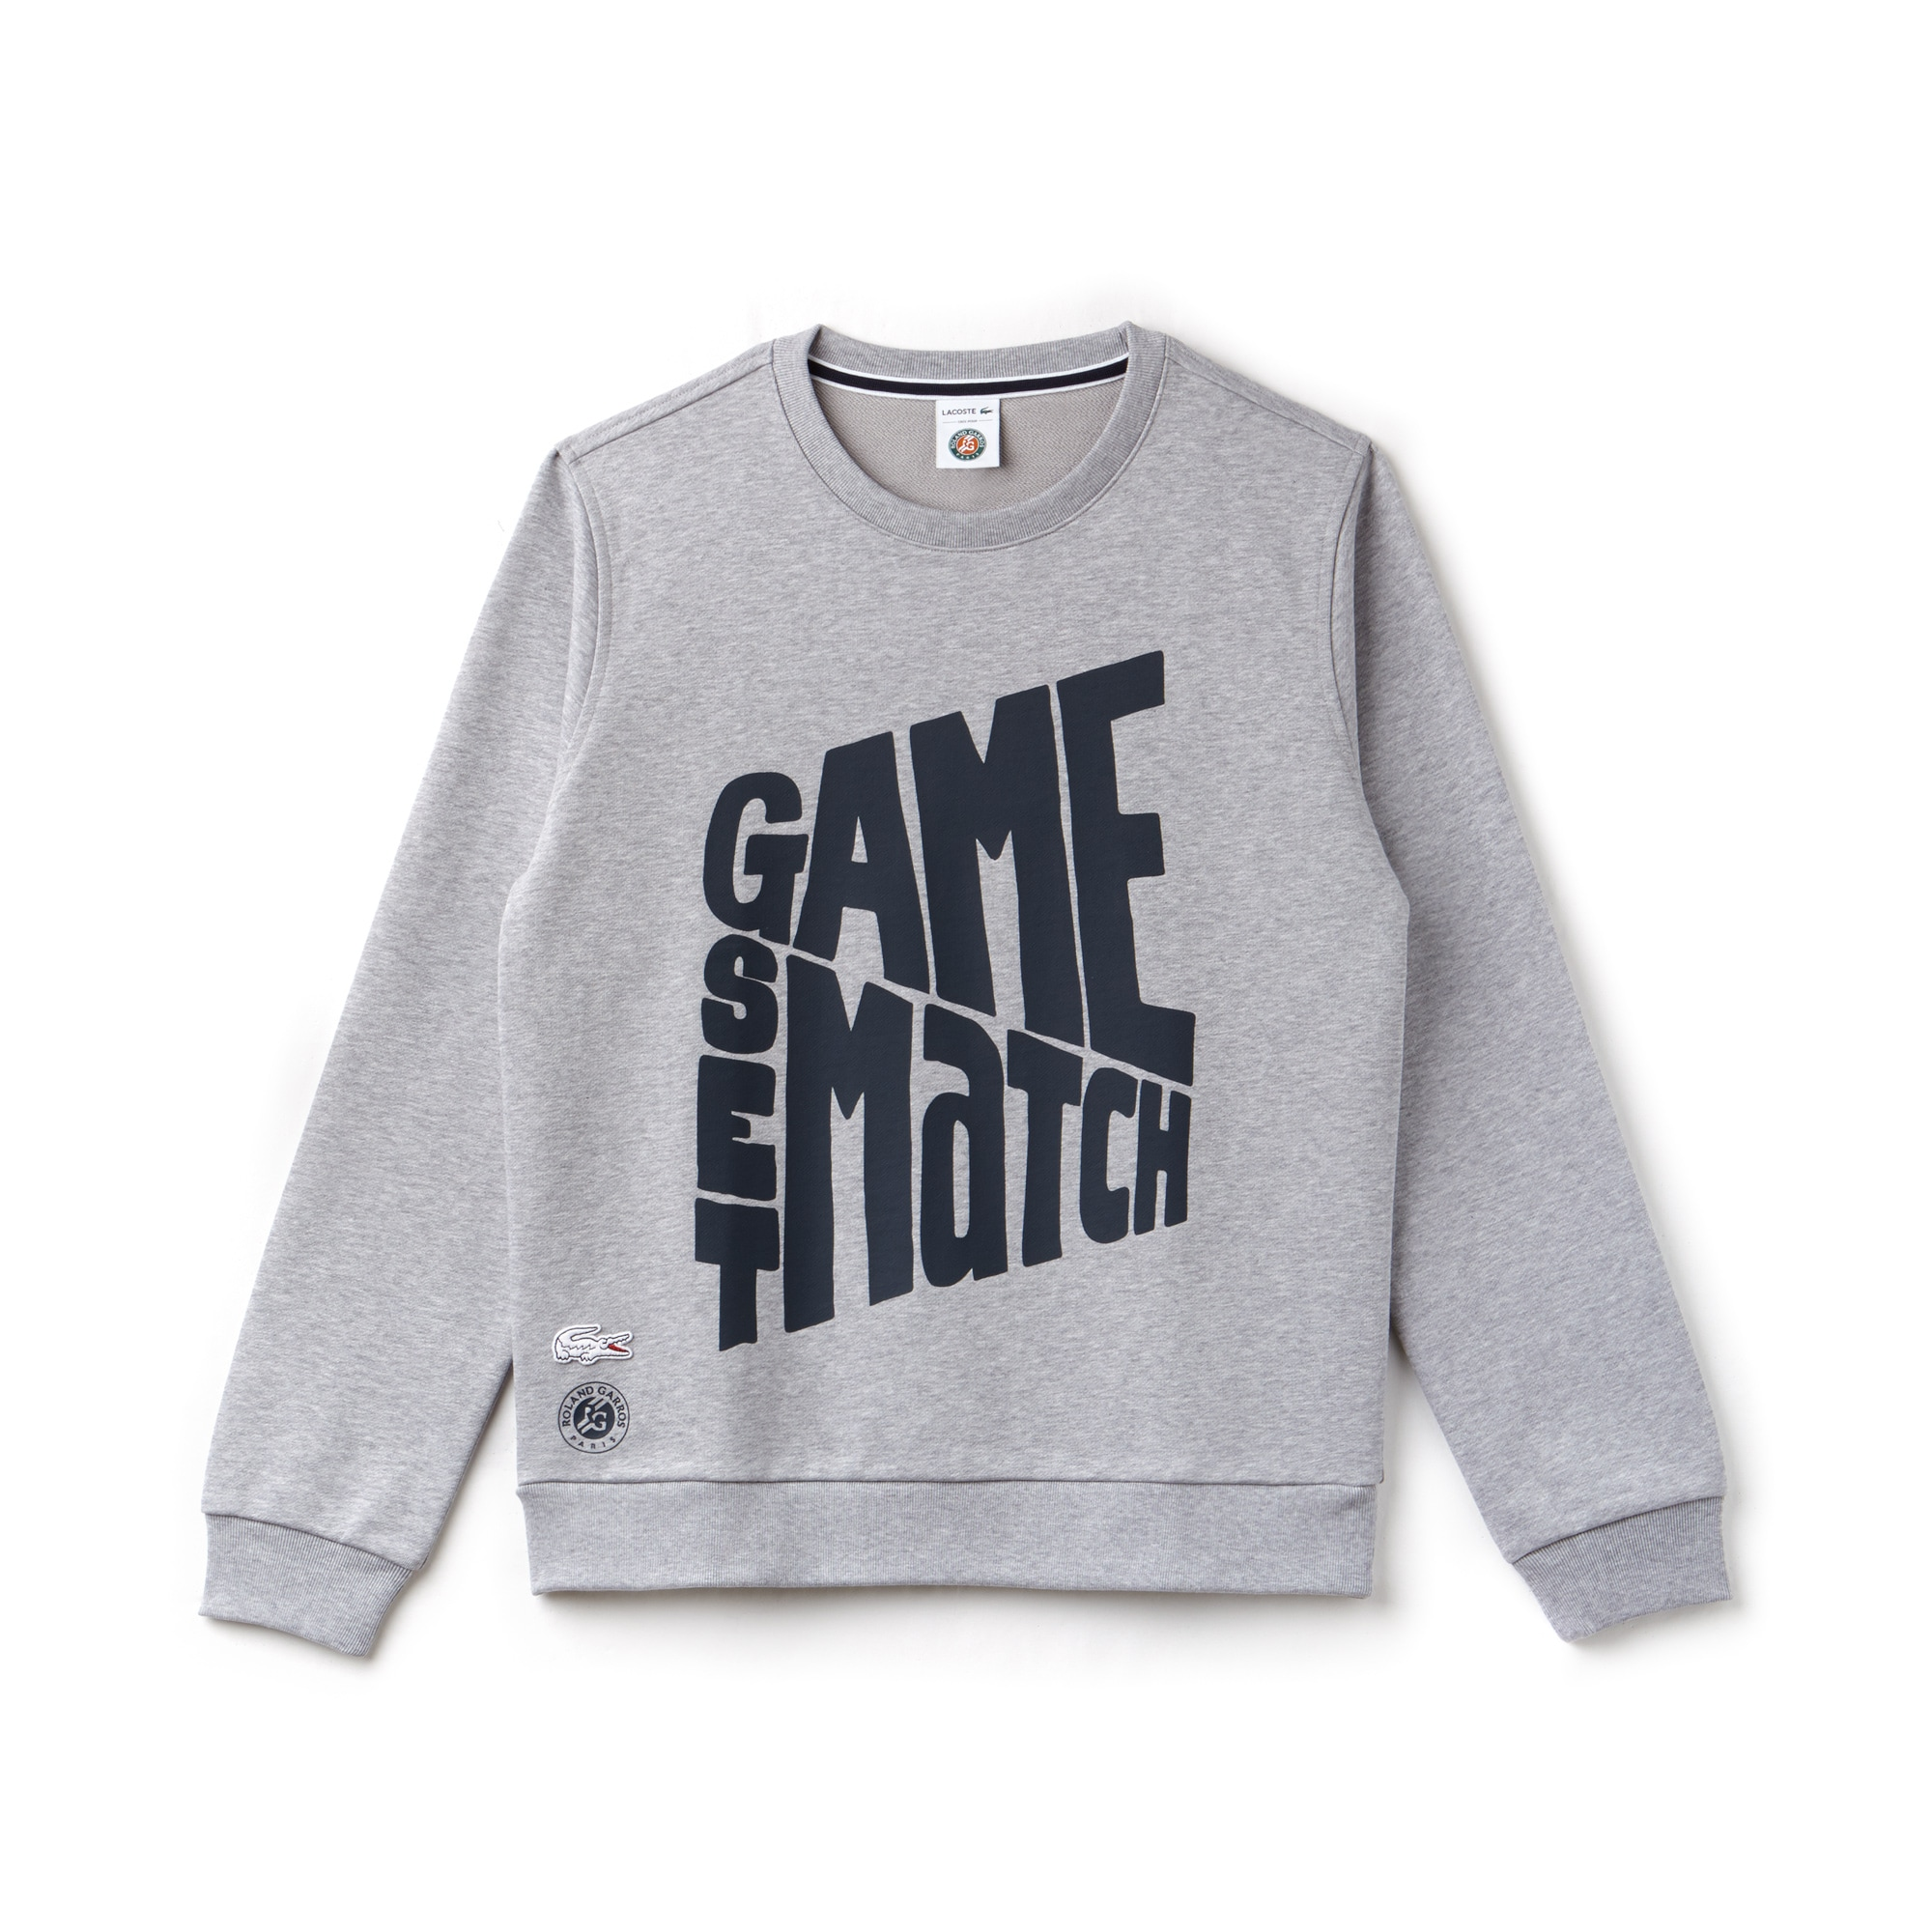 Men's Lacoste SPORT Roland Garros Edition Design Fleece Sweatshirt